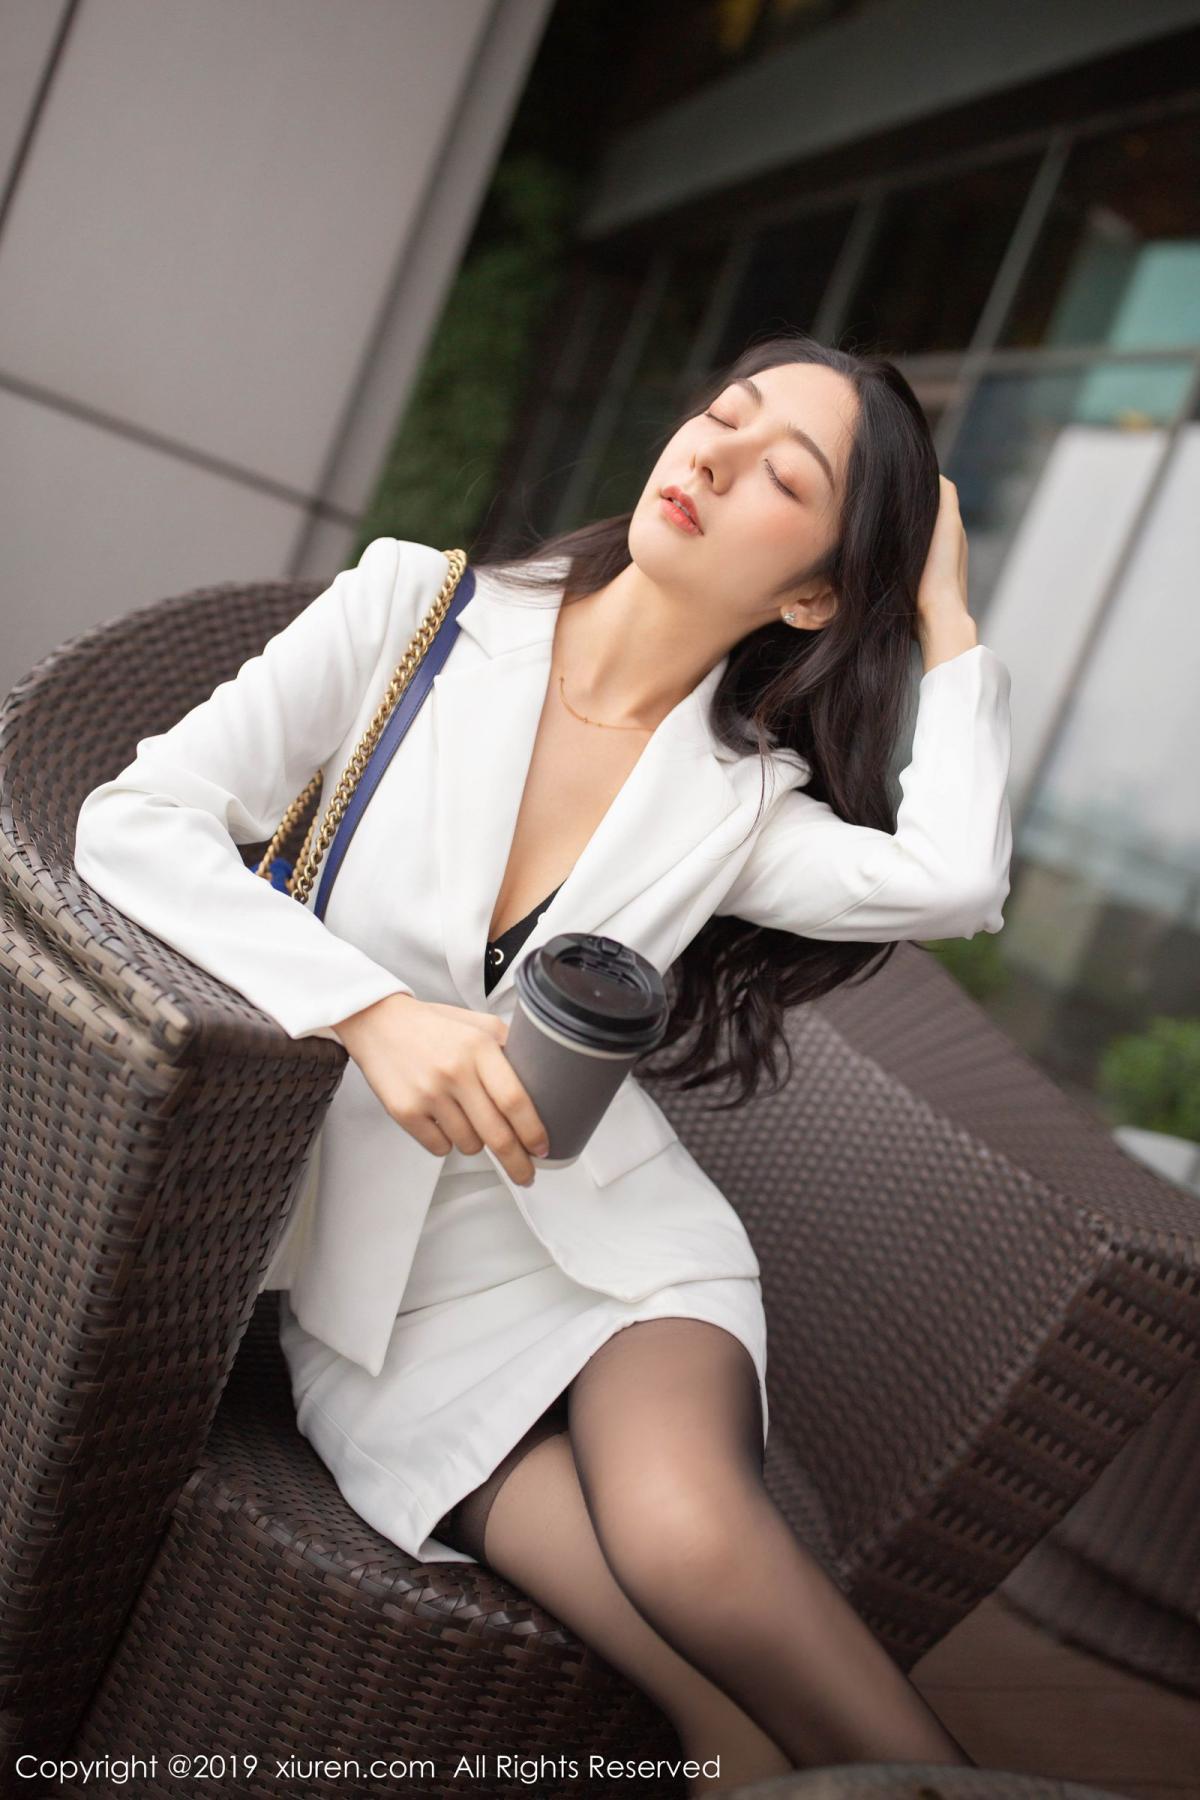 [XiuRen] Vol.1821 Come to my room and sit after you get off work 23P, Black Silk, Di Yi, Xiuren